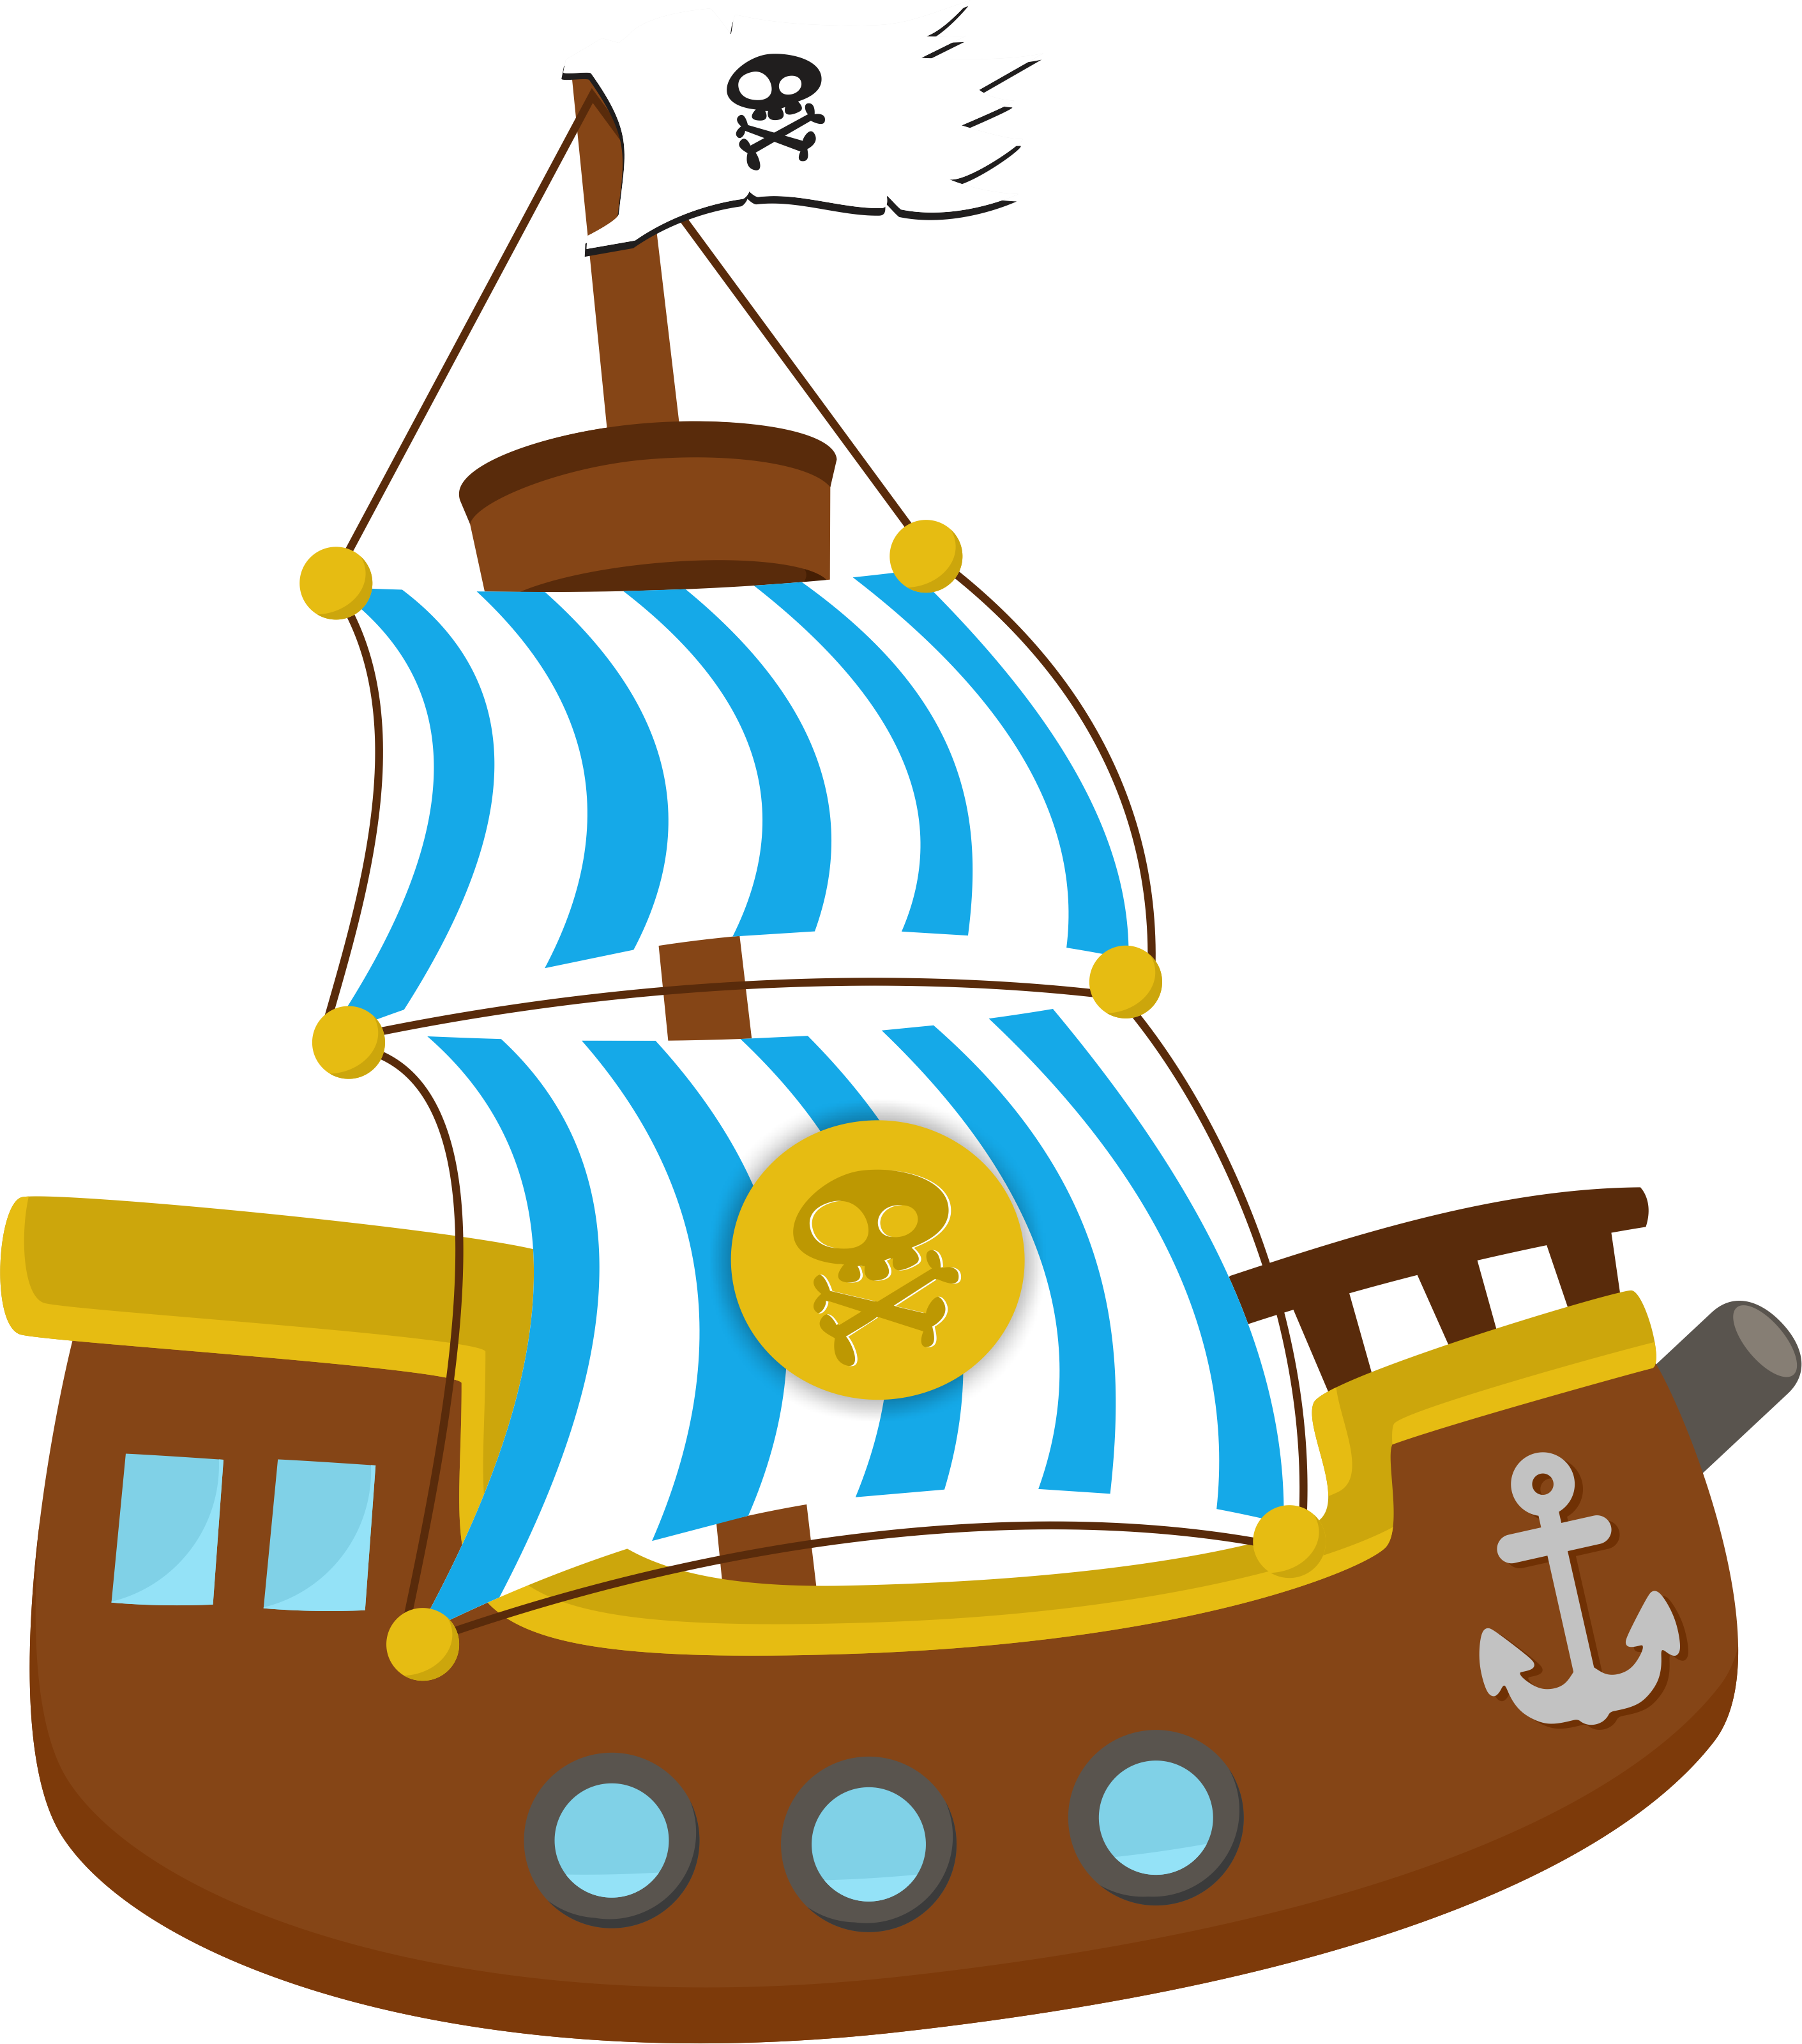 clipart transparent stock Minus selma de avila. Boats clipart tanker